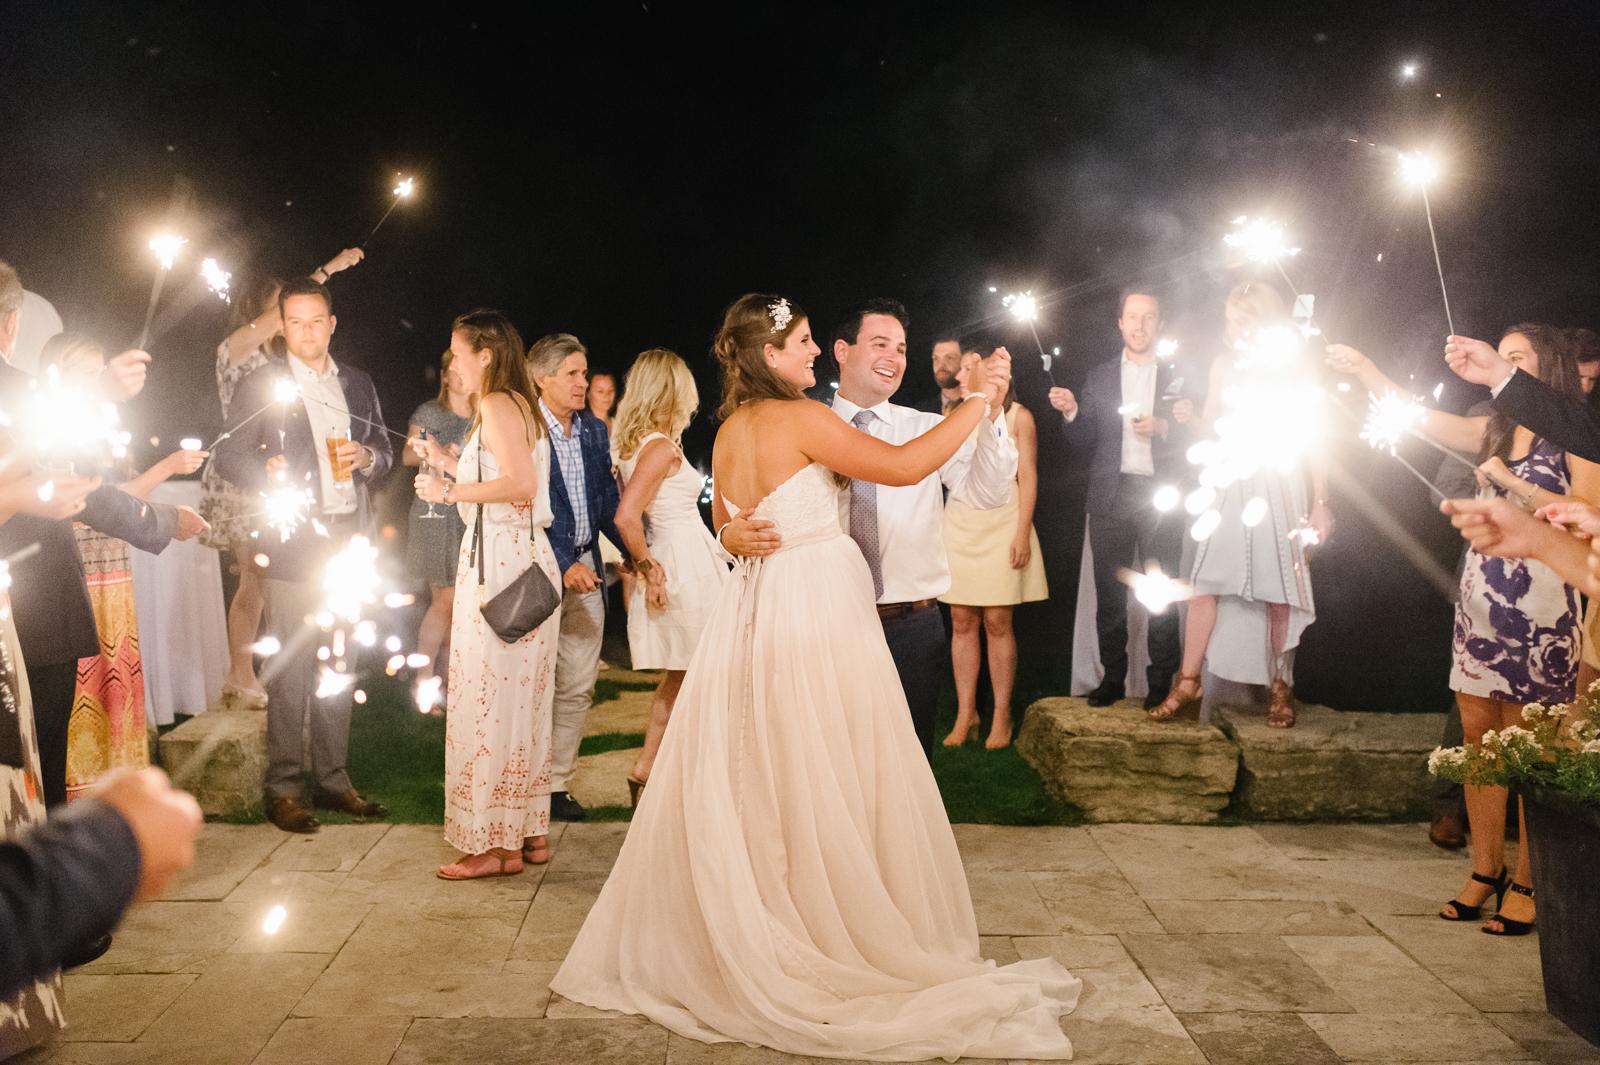 tara mcmullen photography muskoka wedding photographer st peters on the rock wedding photos muskoka wedding photos where to get married in muskoka camp ooch wedding-066